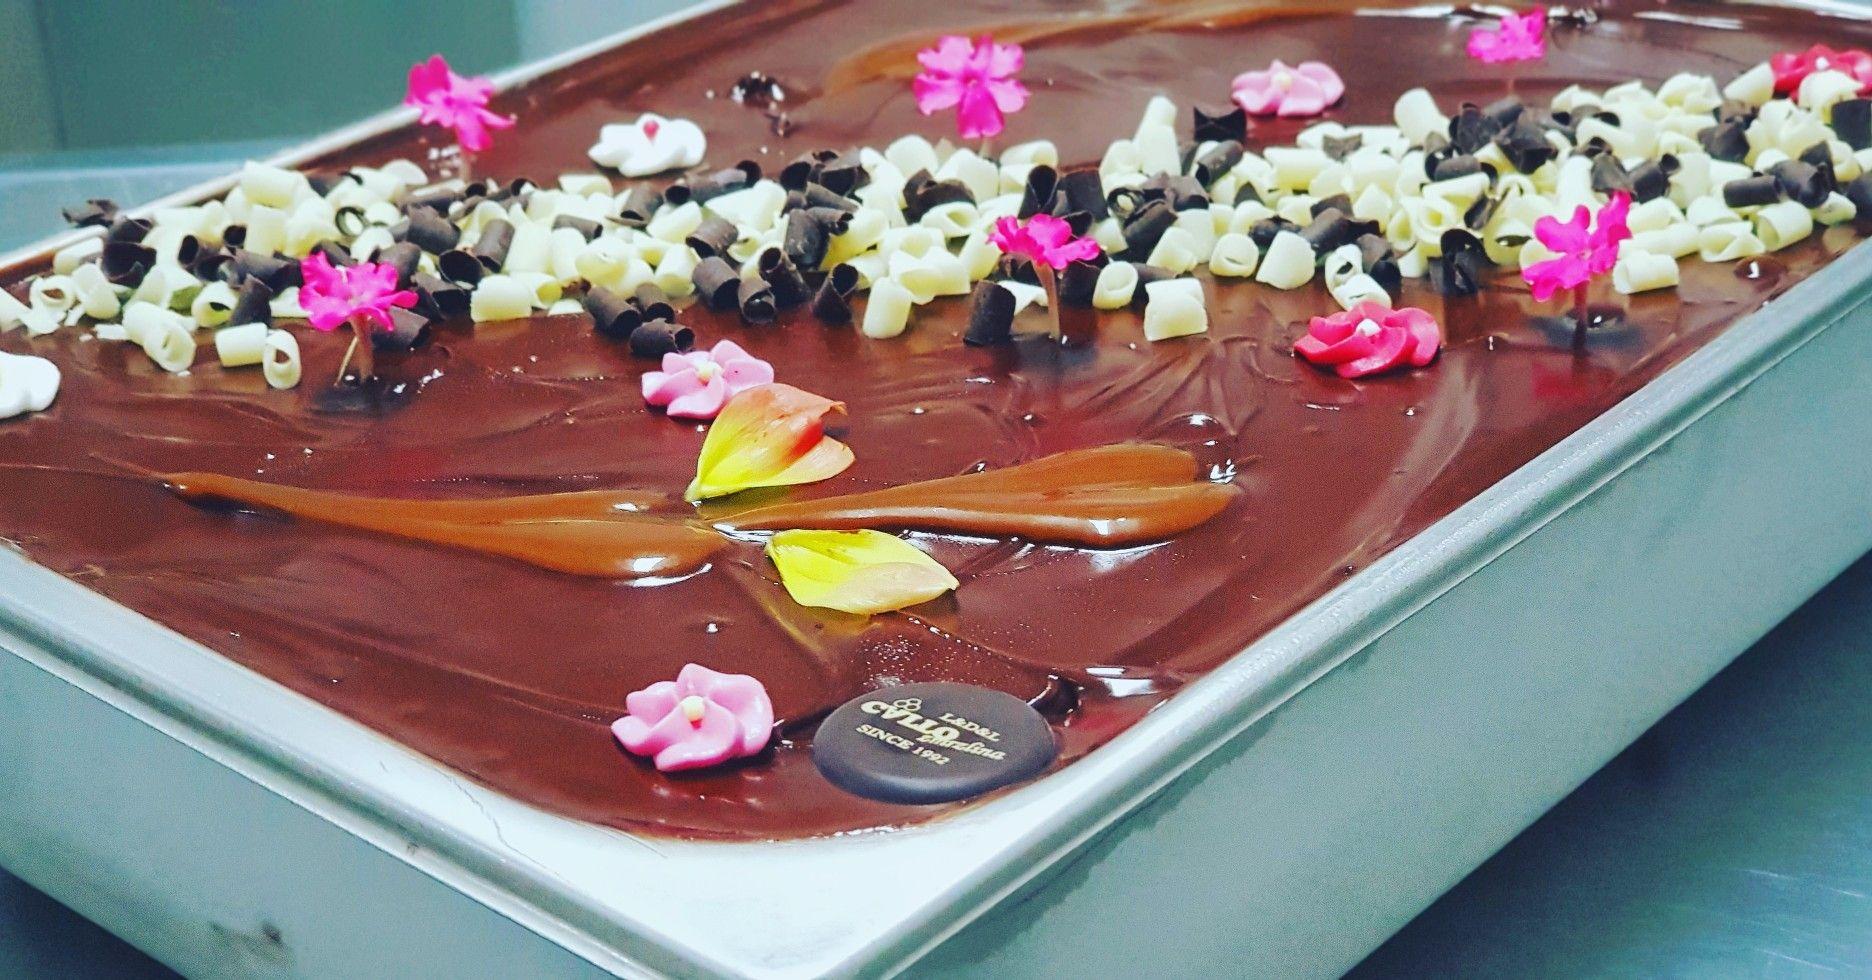 Dekorovanie s jedlými 🌸 . #zmrzlina #dolnykubin #instalike #love #uzasnejedlo #chocolate #icecream #instacool #instafood #blackandwhite #chocolatelove #callozmrzlina #delicious #kvety #nature #slovensko #foodlife #priroda #milujemejedlo #milujemkvety #slovenskojekrasne #instafollow #orava #tasty #instalove #jedlekvety #summer #gastronomi #cool #food